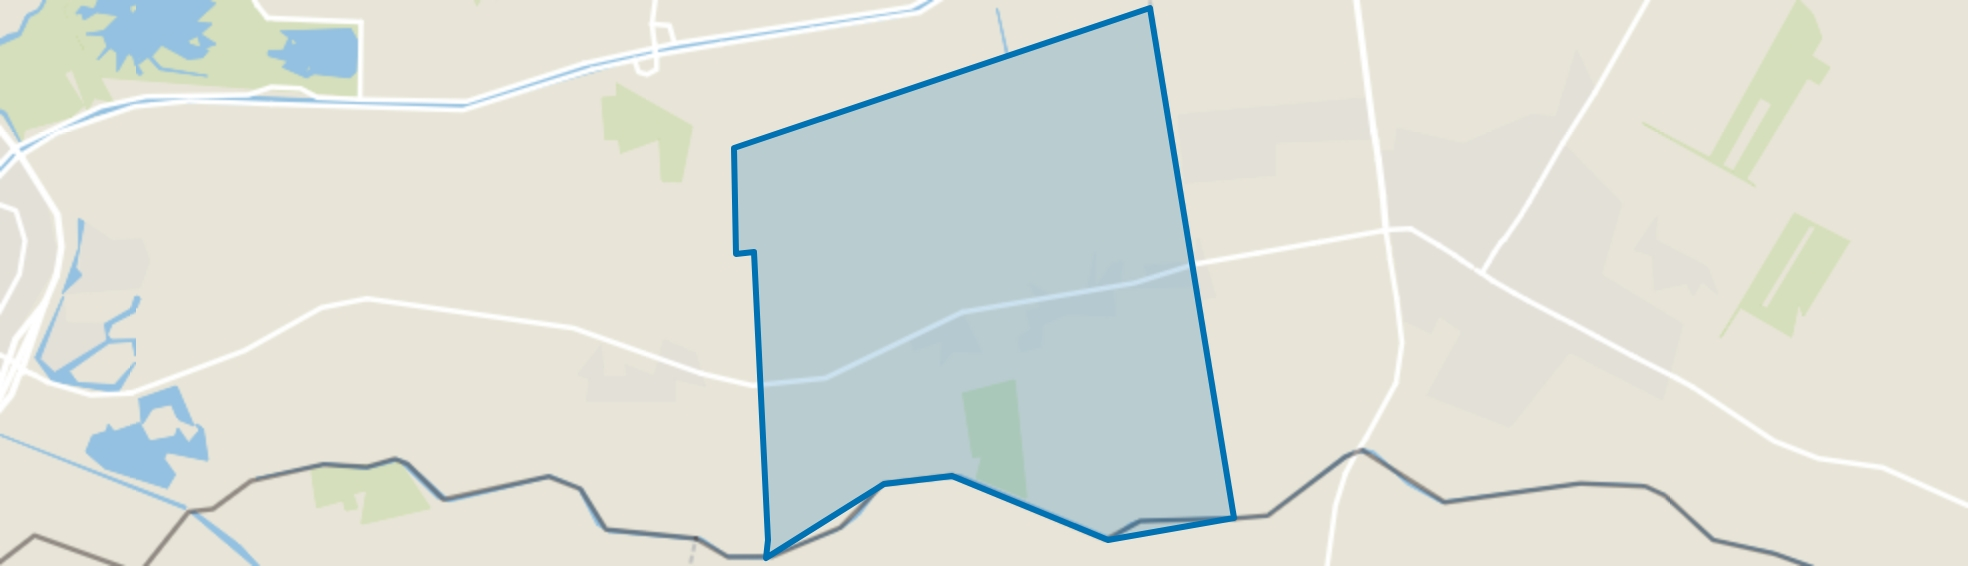 Verspreide huizen Vlieghuis en Padhuis, Coevorden map